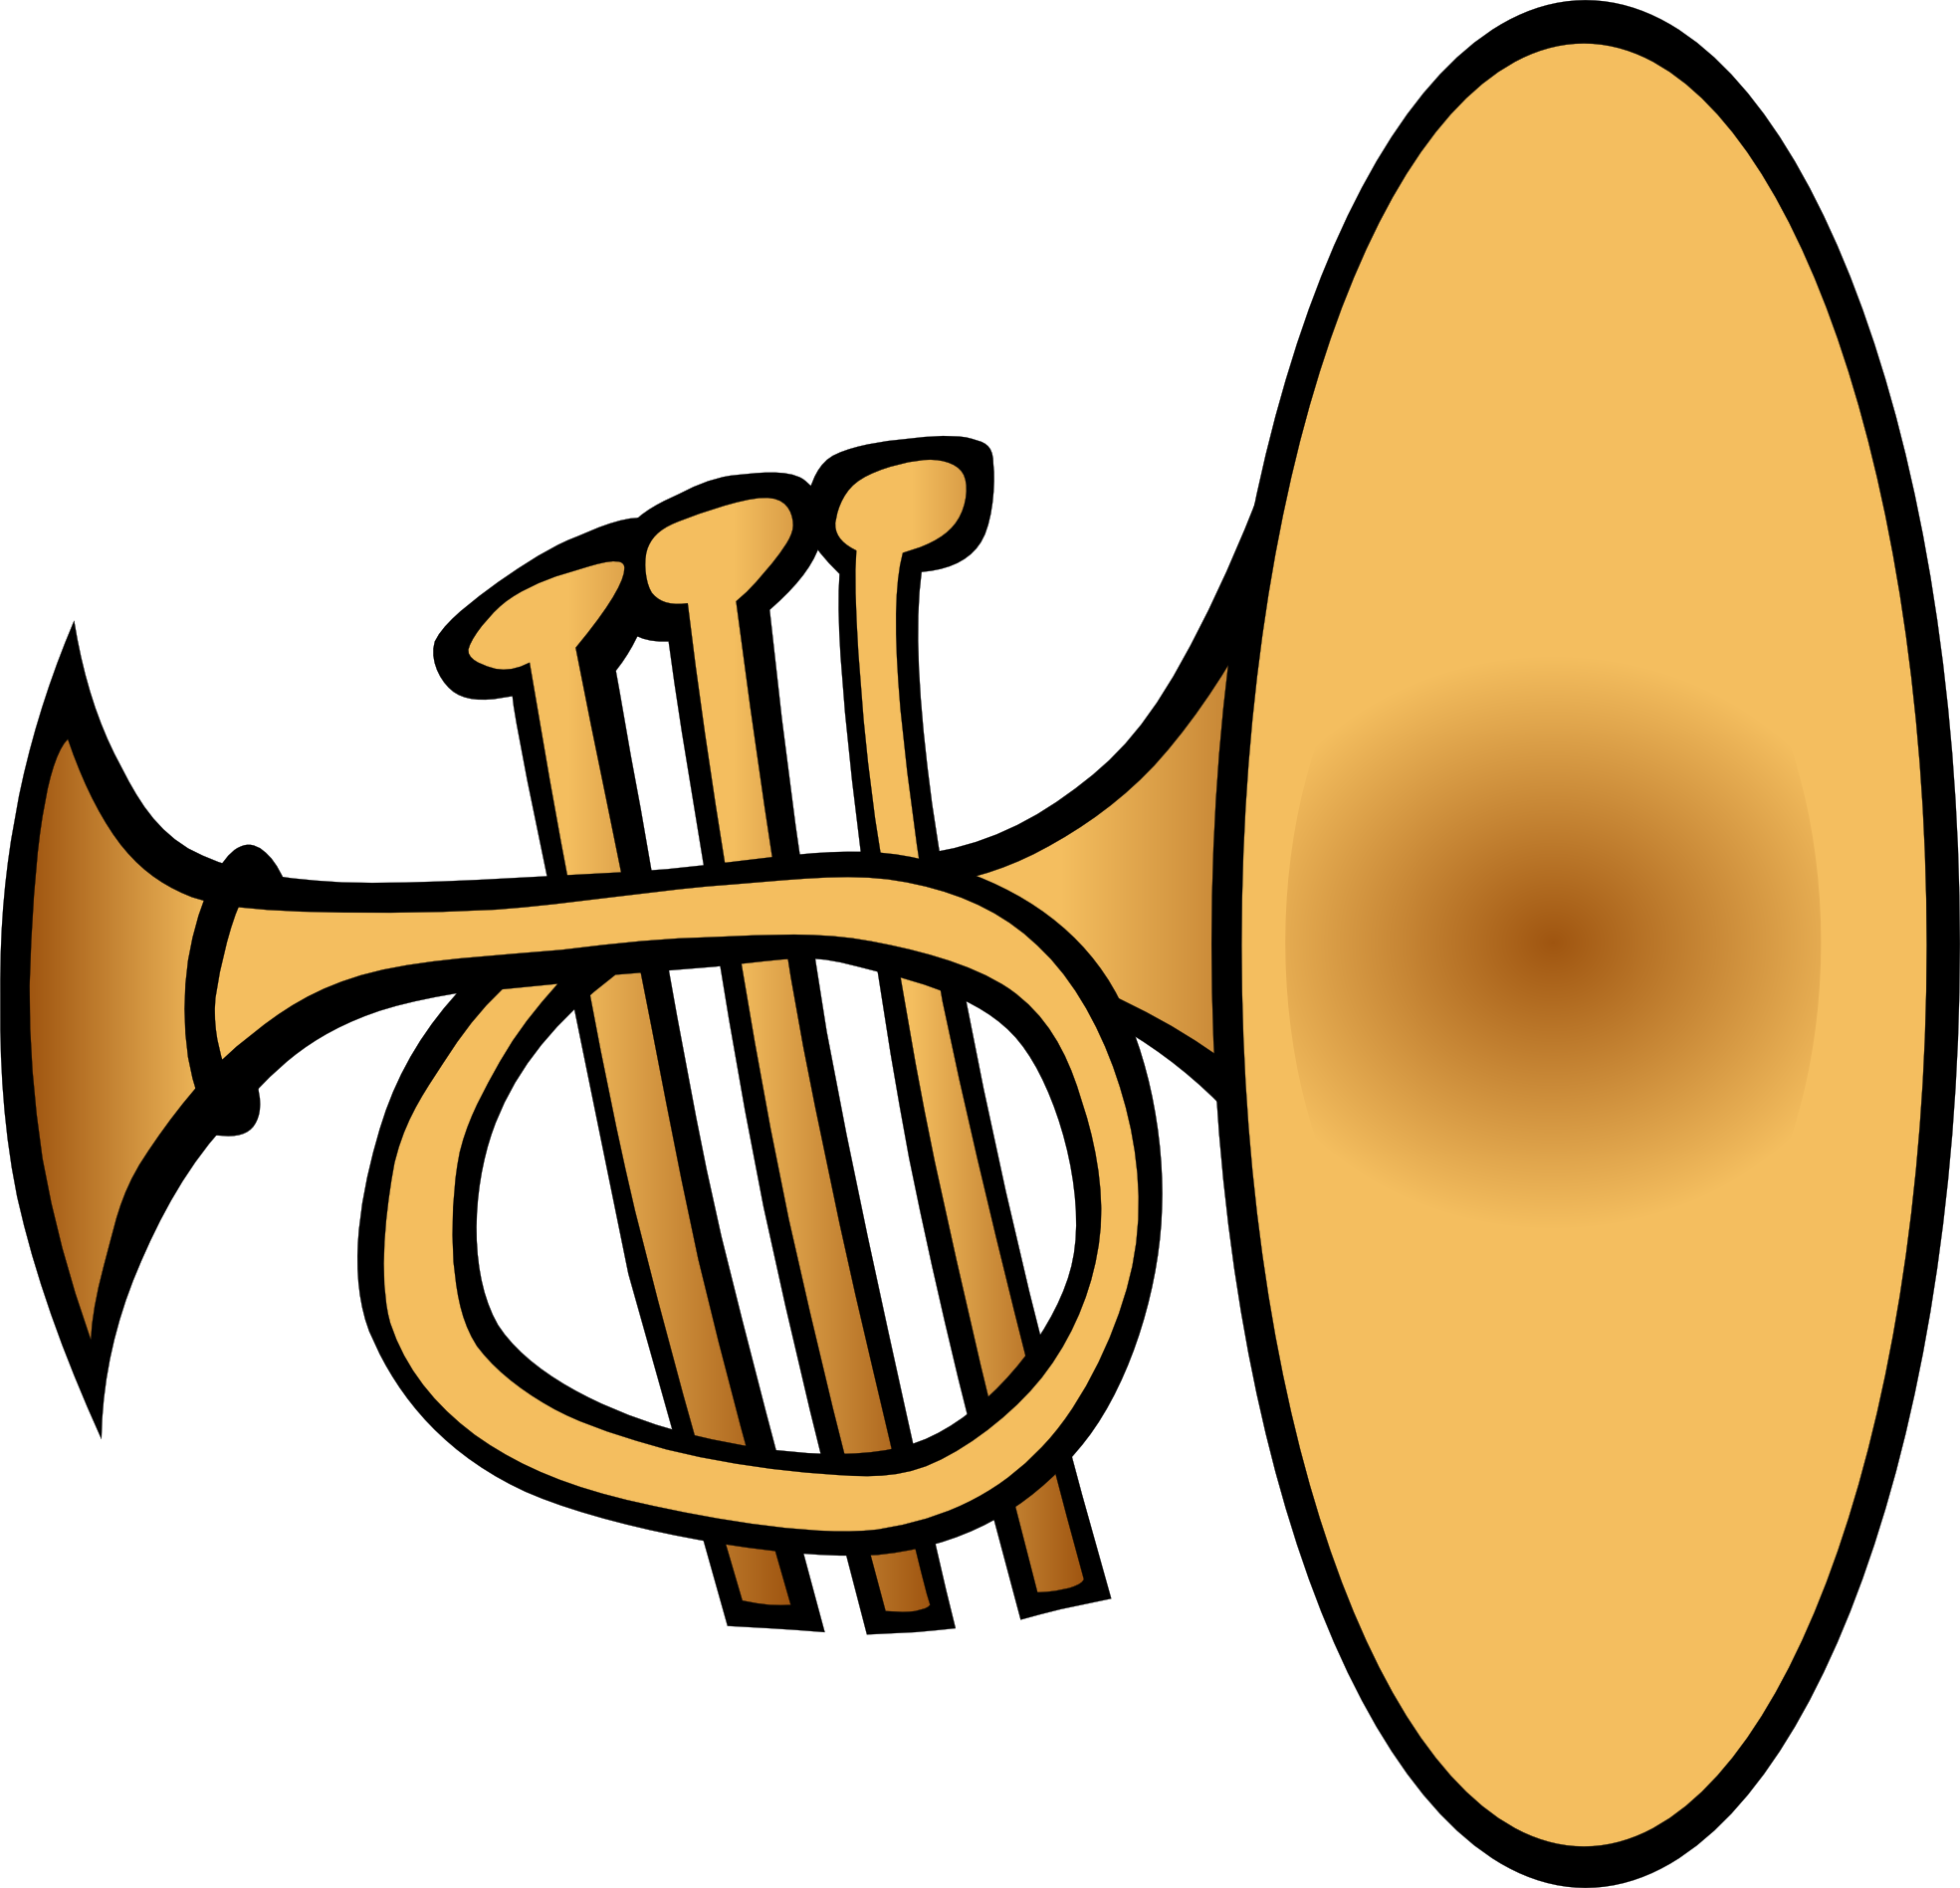 Free Trumpet Images, Download Free Clip Art, Free Clip Art.